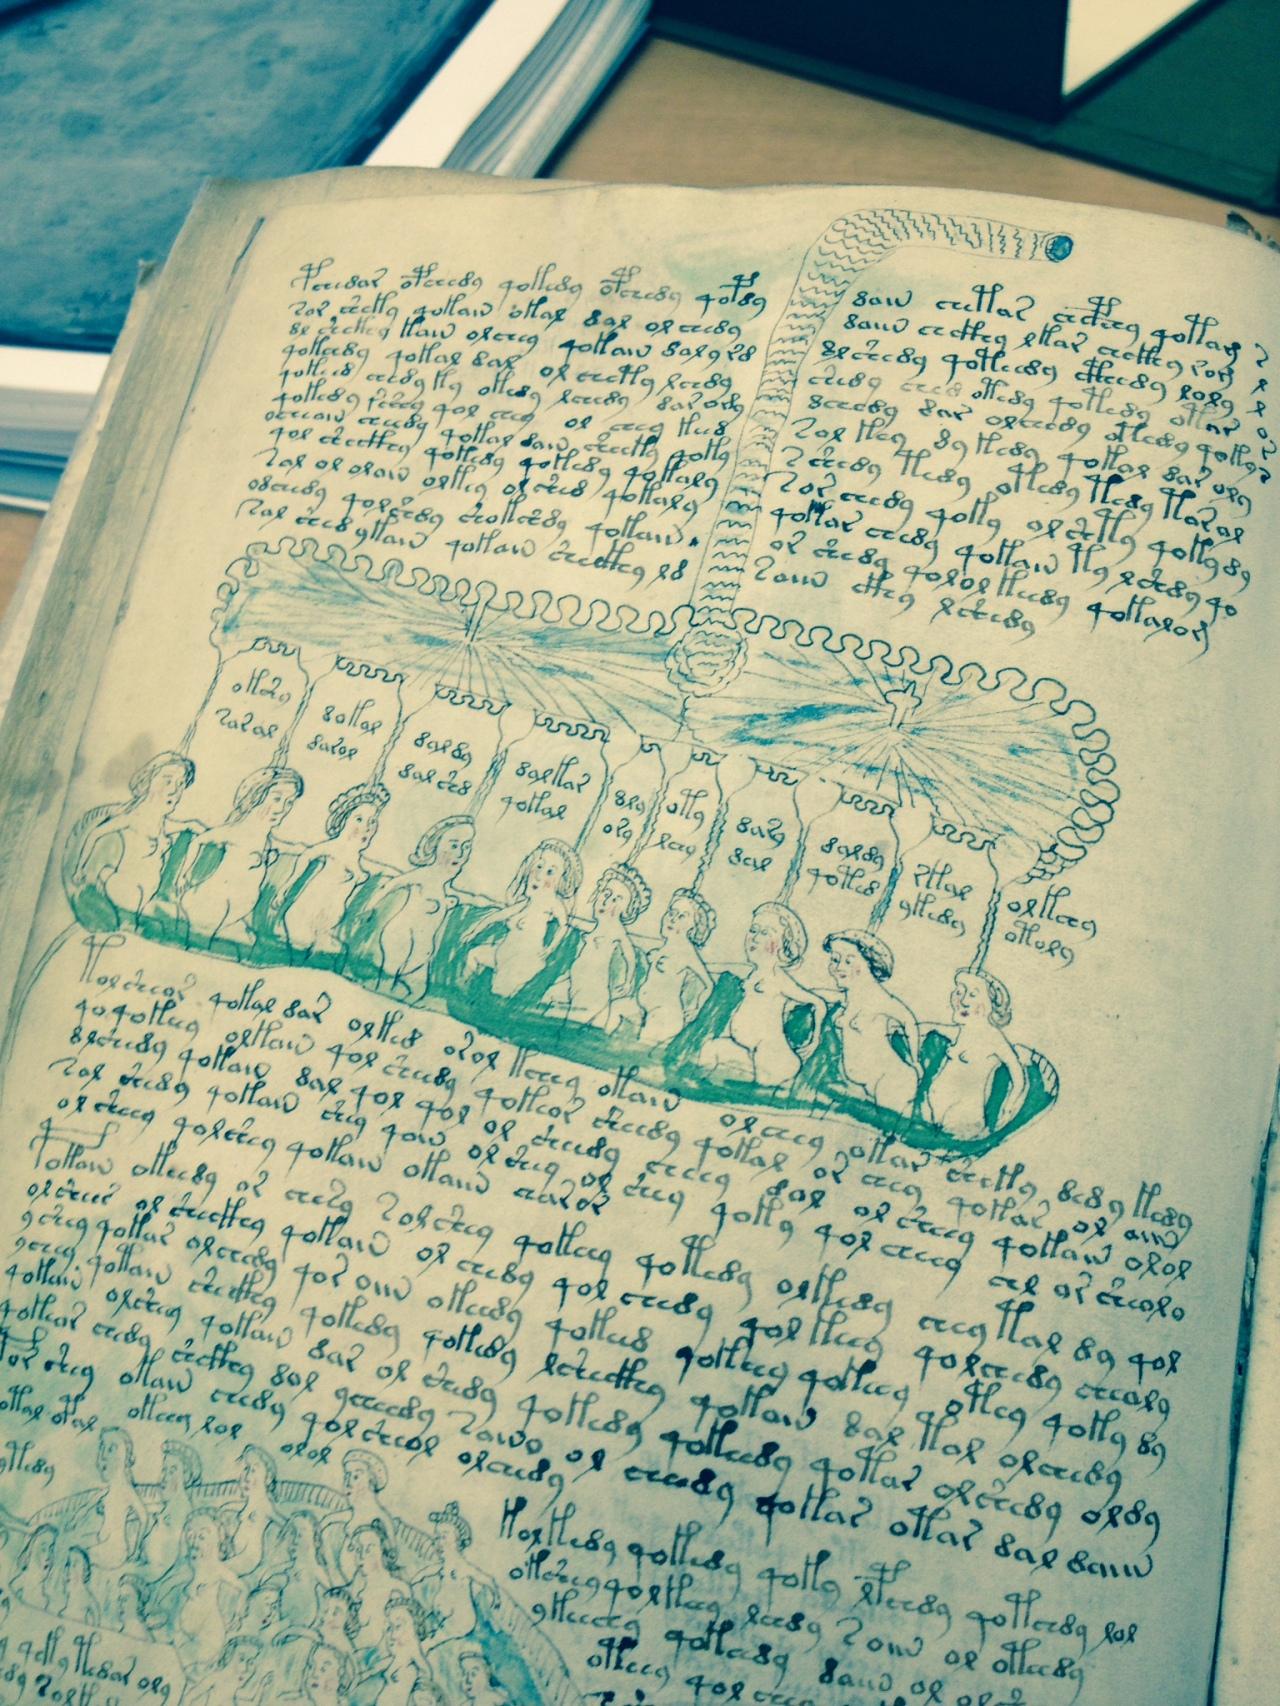 Illustration from the Voynich Manuscript photo by Hillary Raimo Yale University